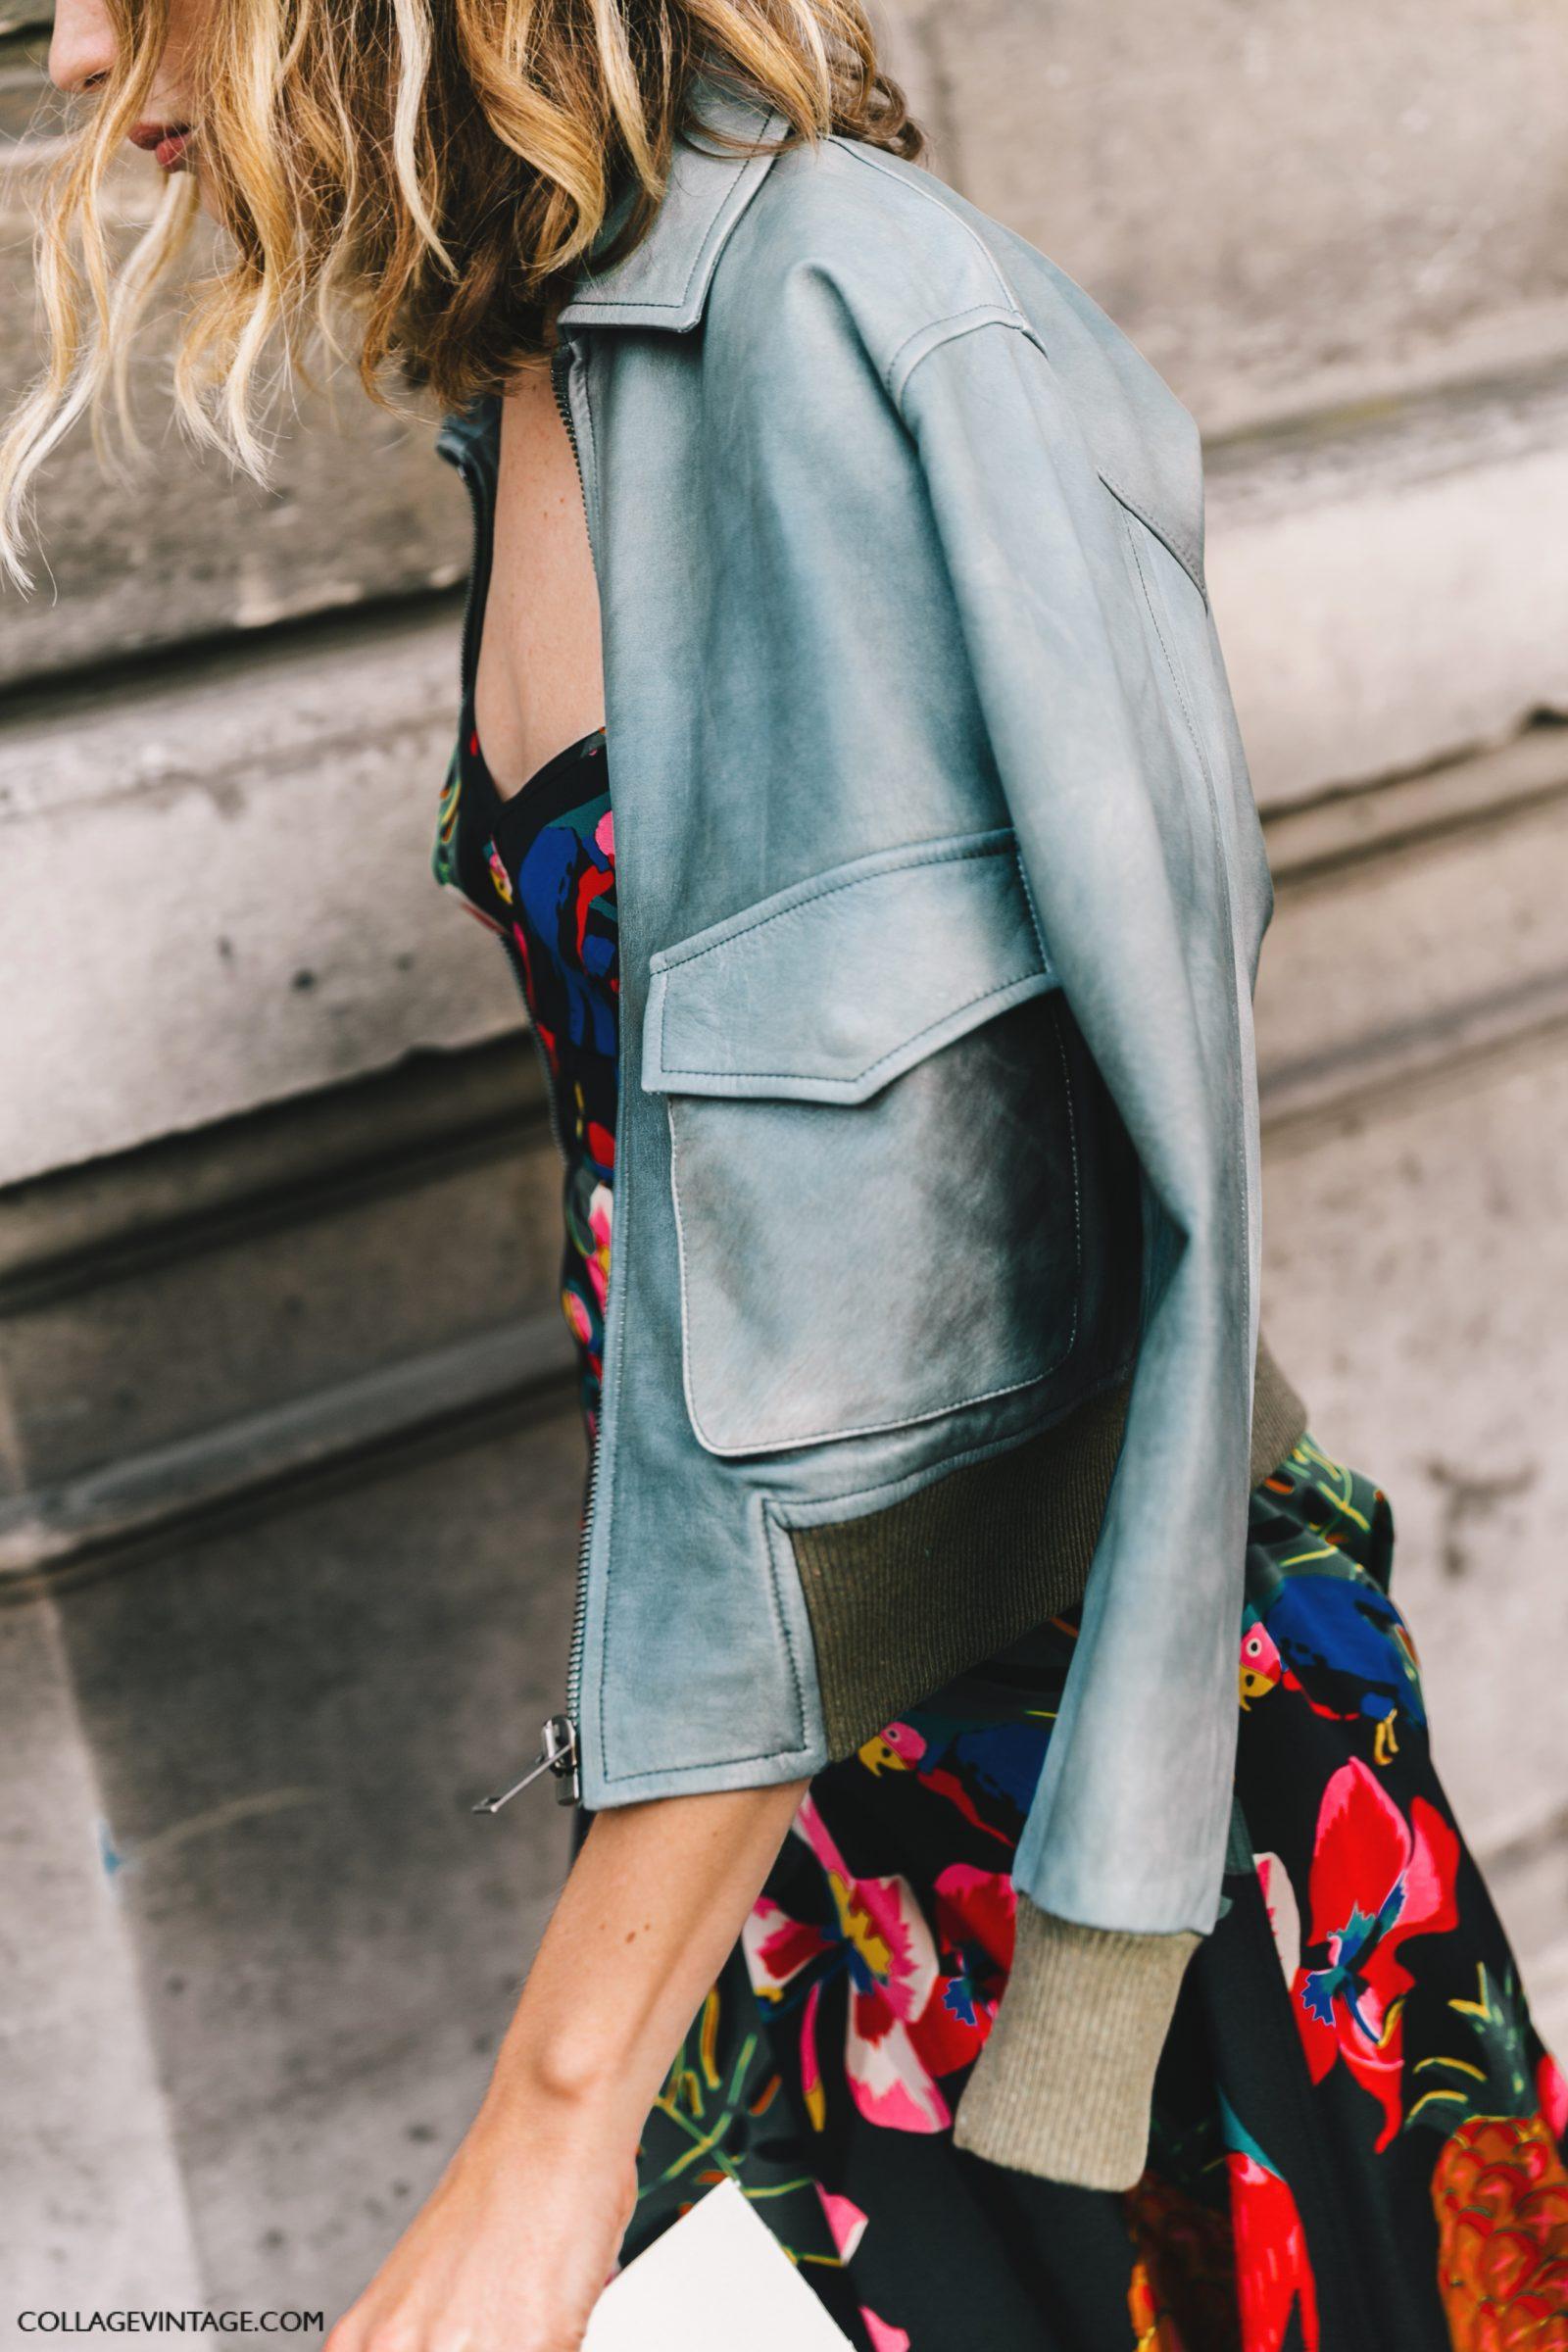 pfw-paris_fashion_week_ss17-street_style-outfits-collage_vintage-valentino-balenciaga-celine-128